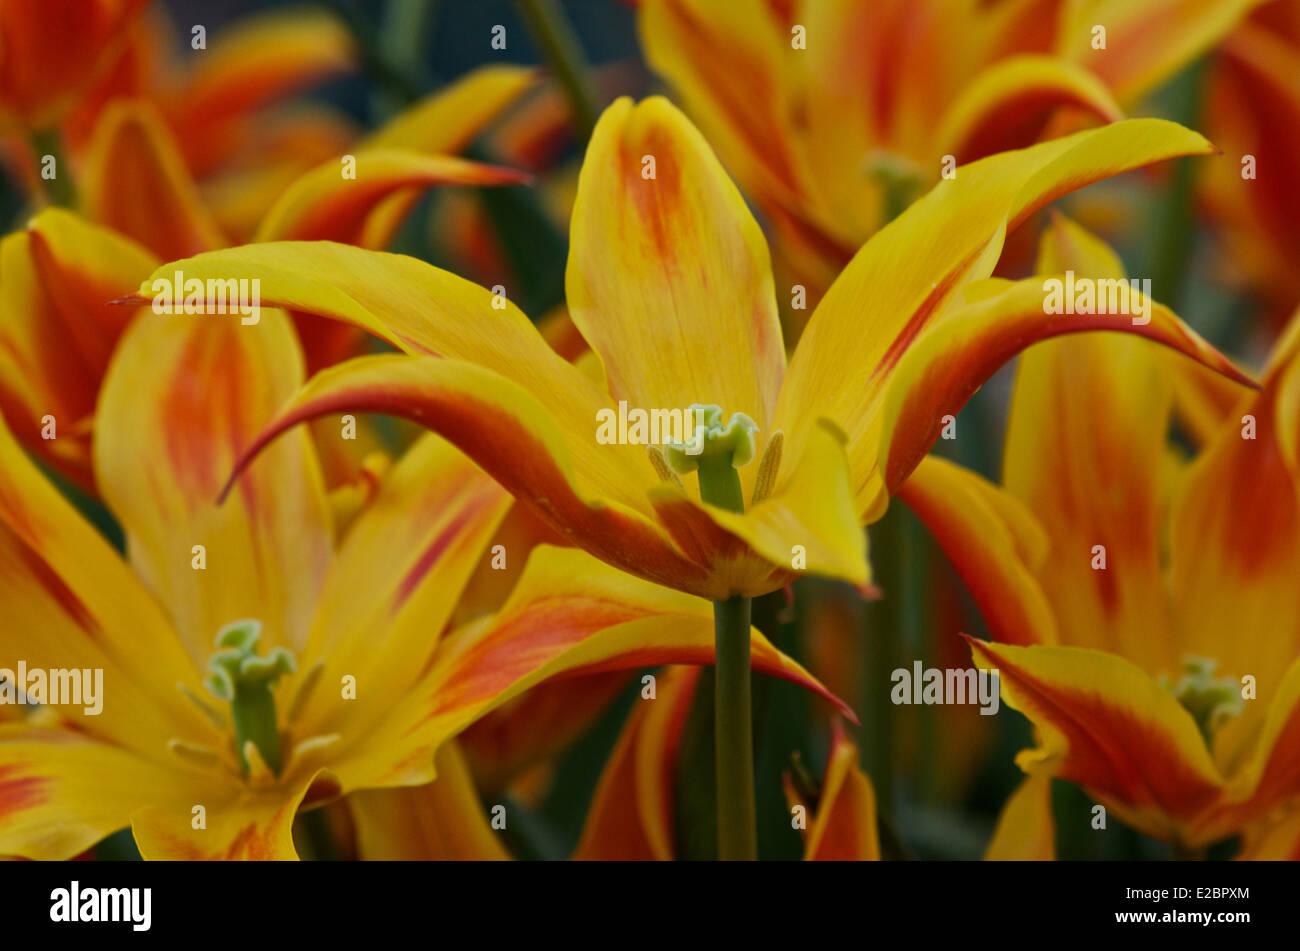 Tulip 'Fly Away' - Stock Image